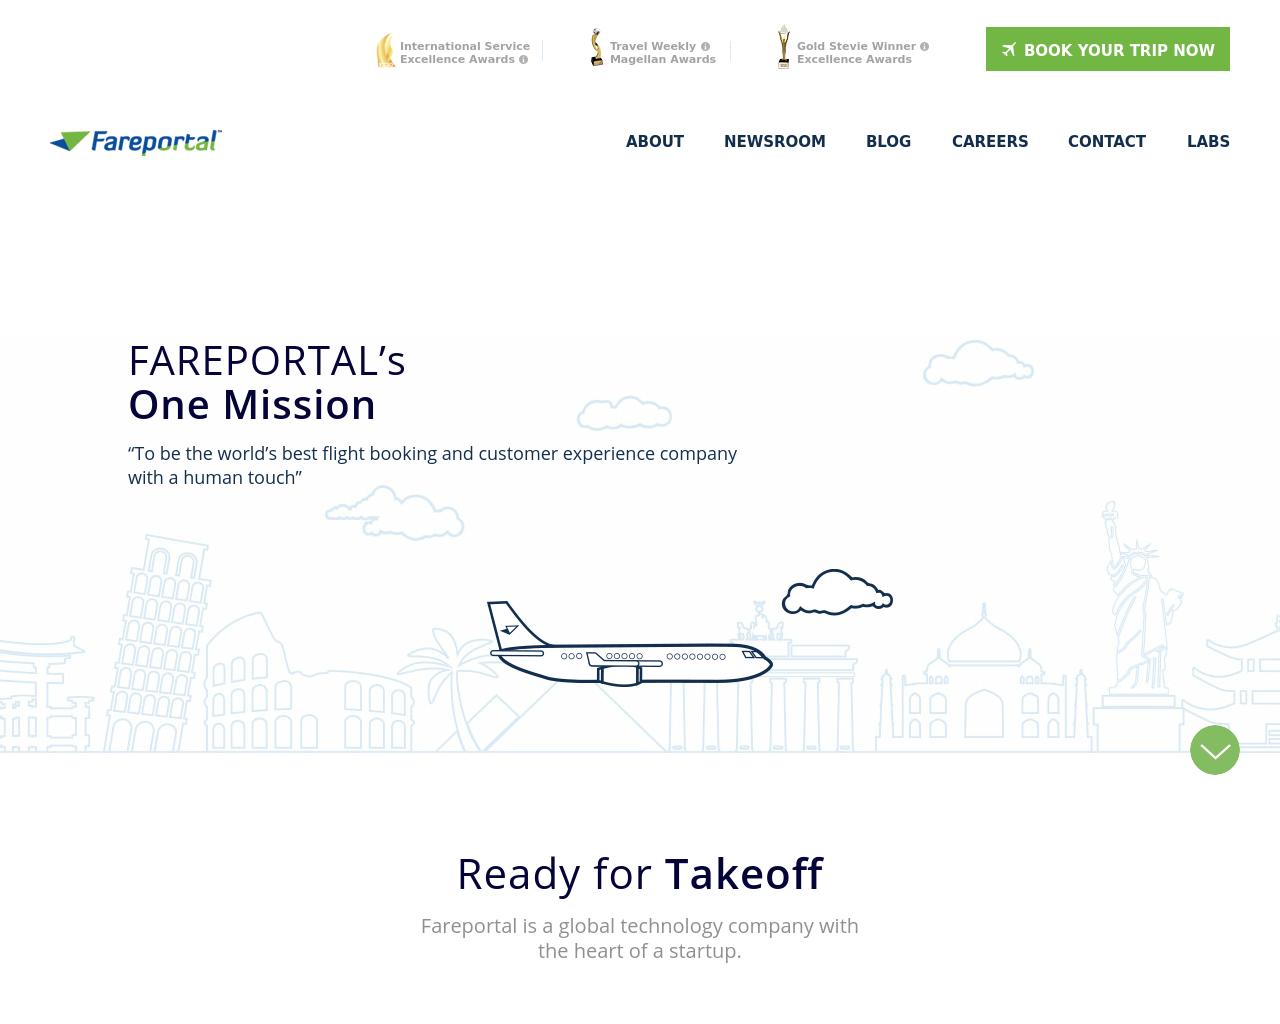 Fareportal-Media-Group-Advertising-Reviews-Pricing